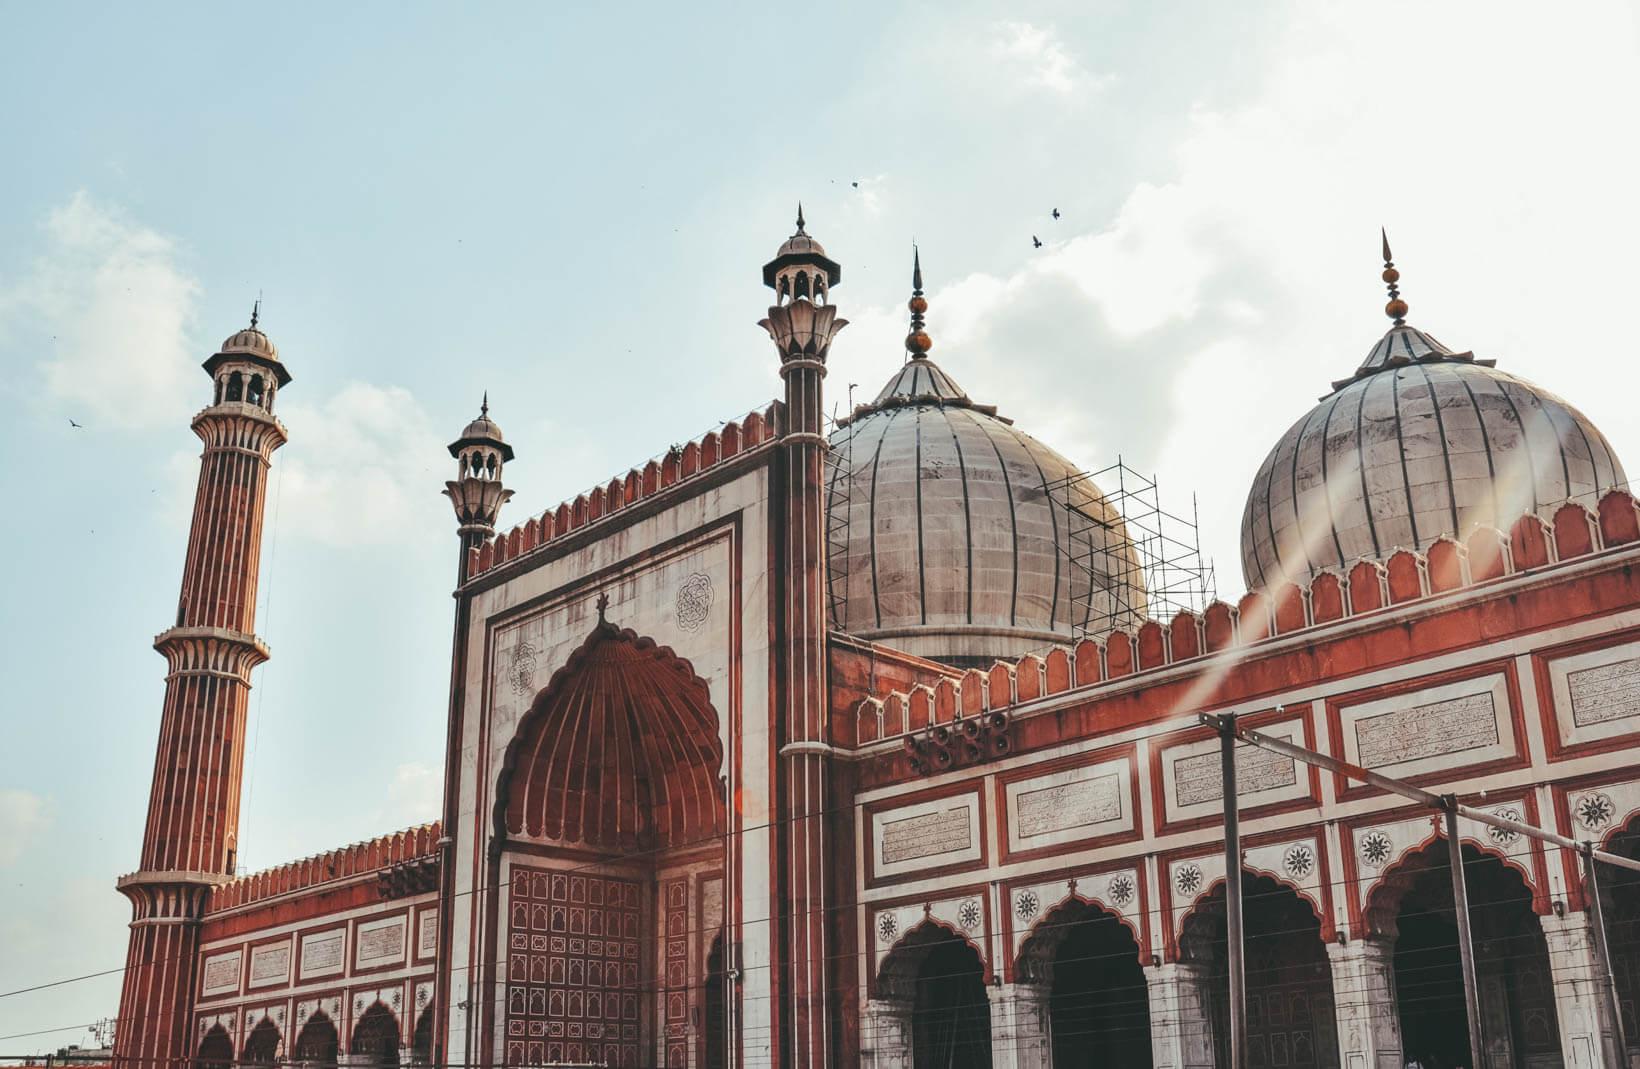 New Delhi Jama Masjid